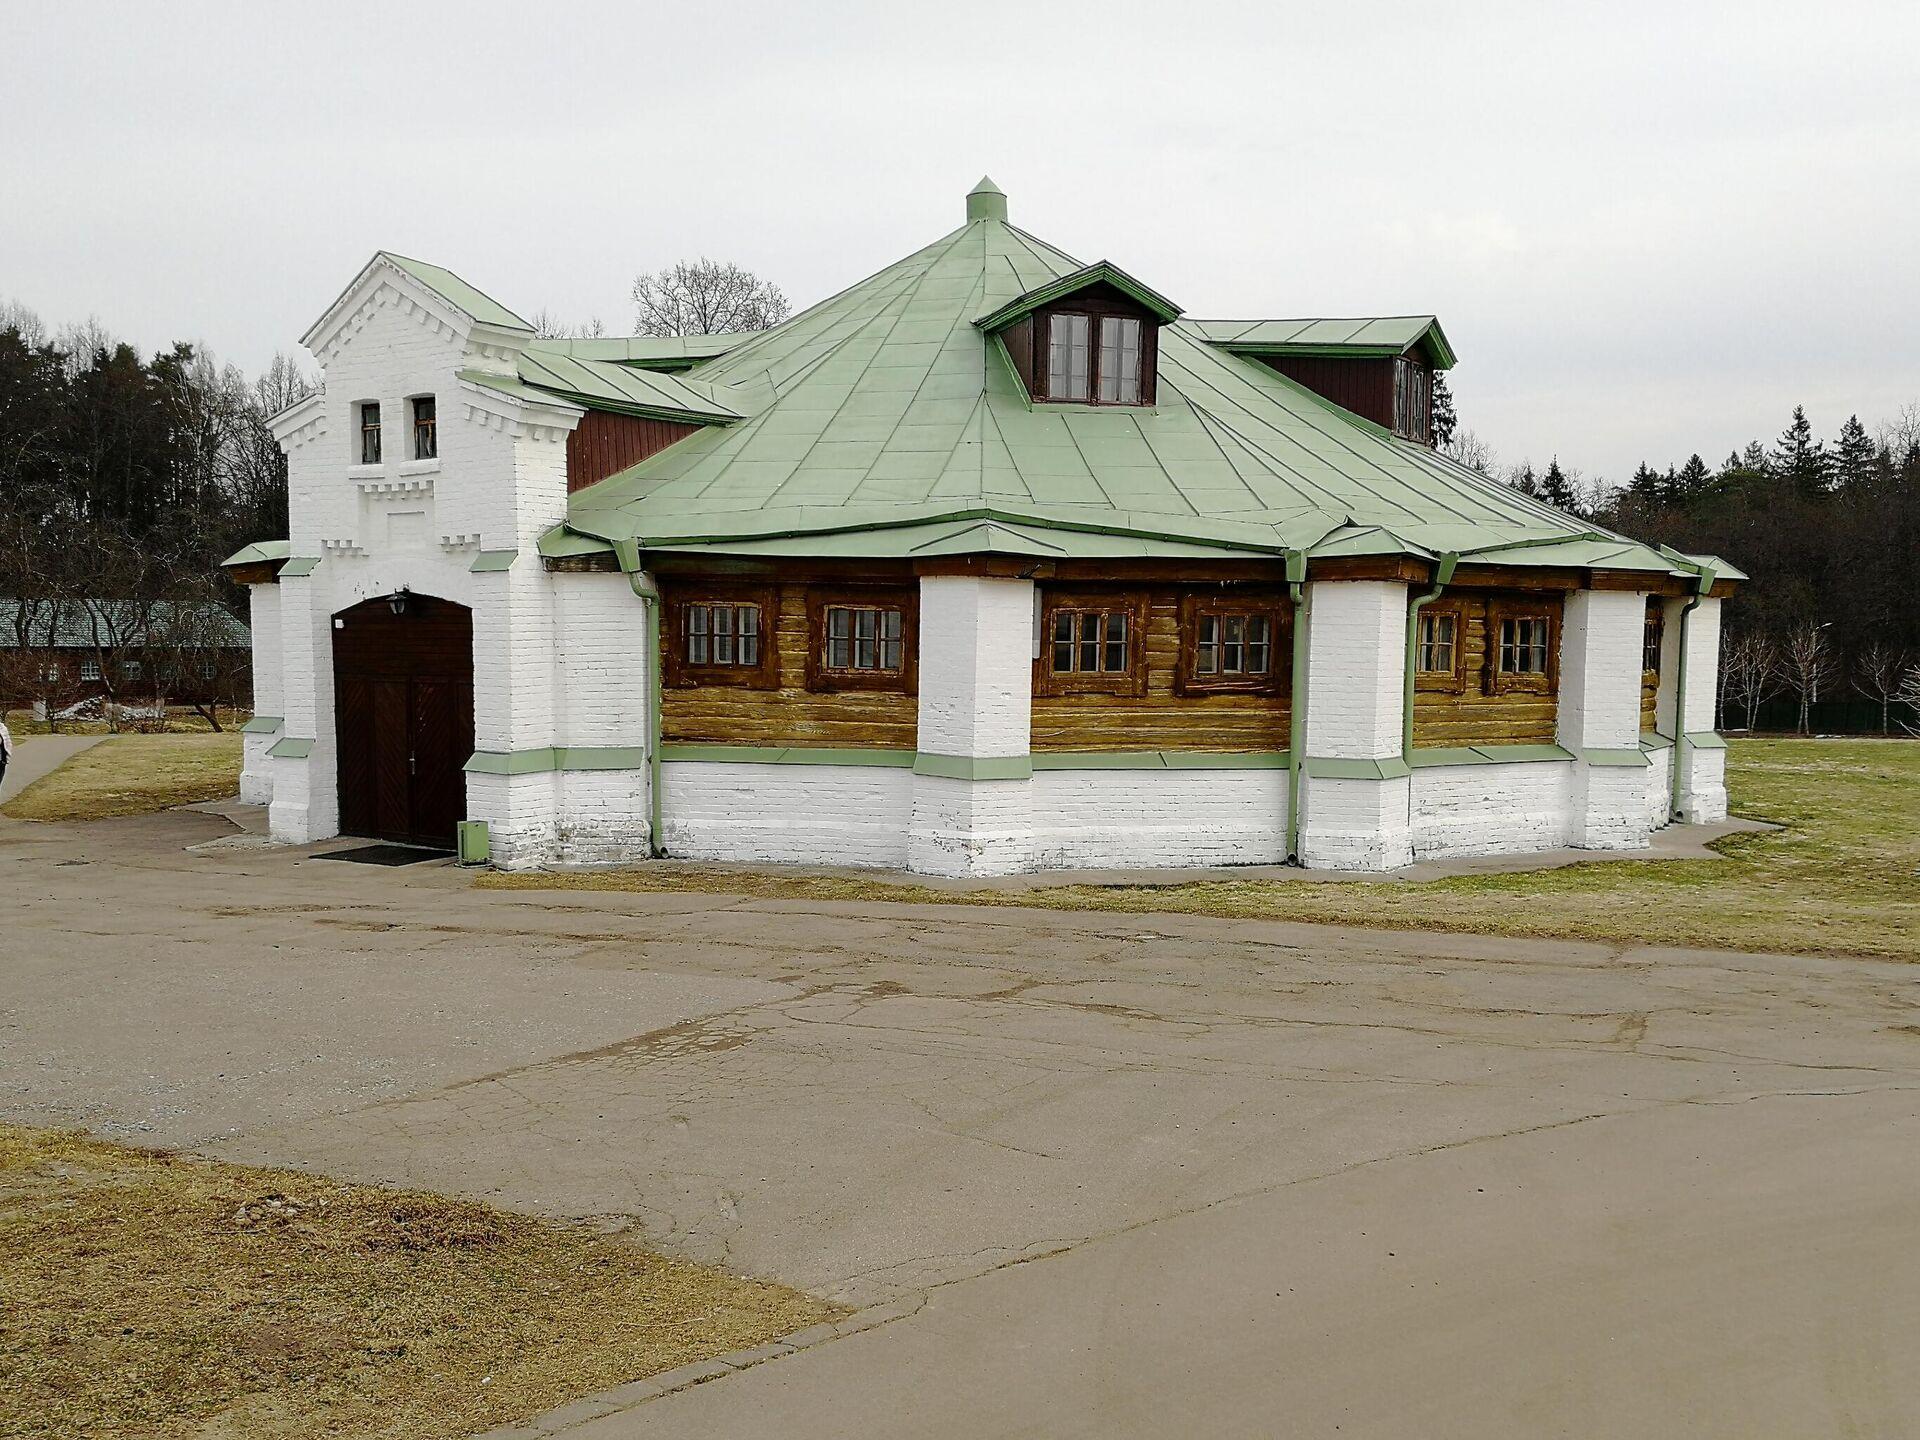 Манеж в усадьбе Середниково - РИА Новости, 1920, 12.05.2021